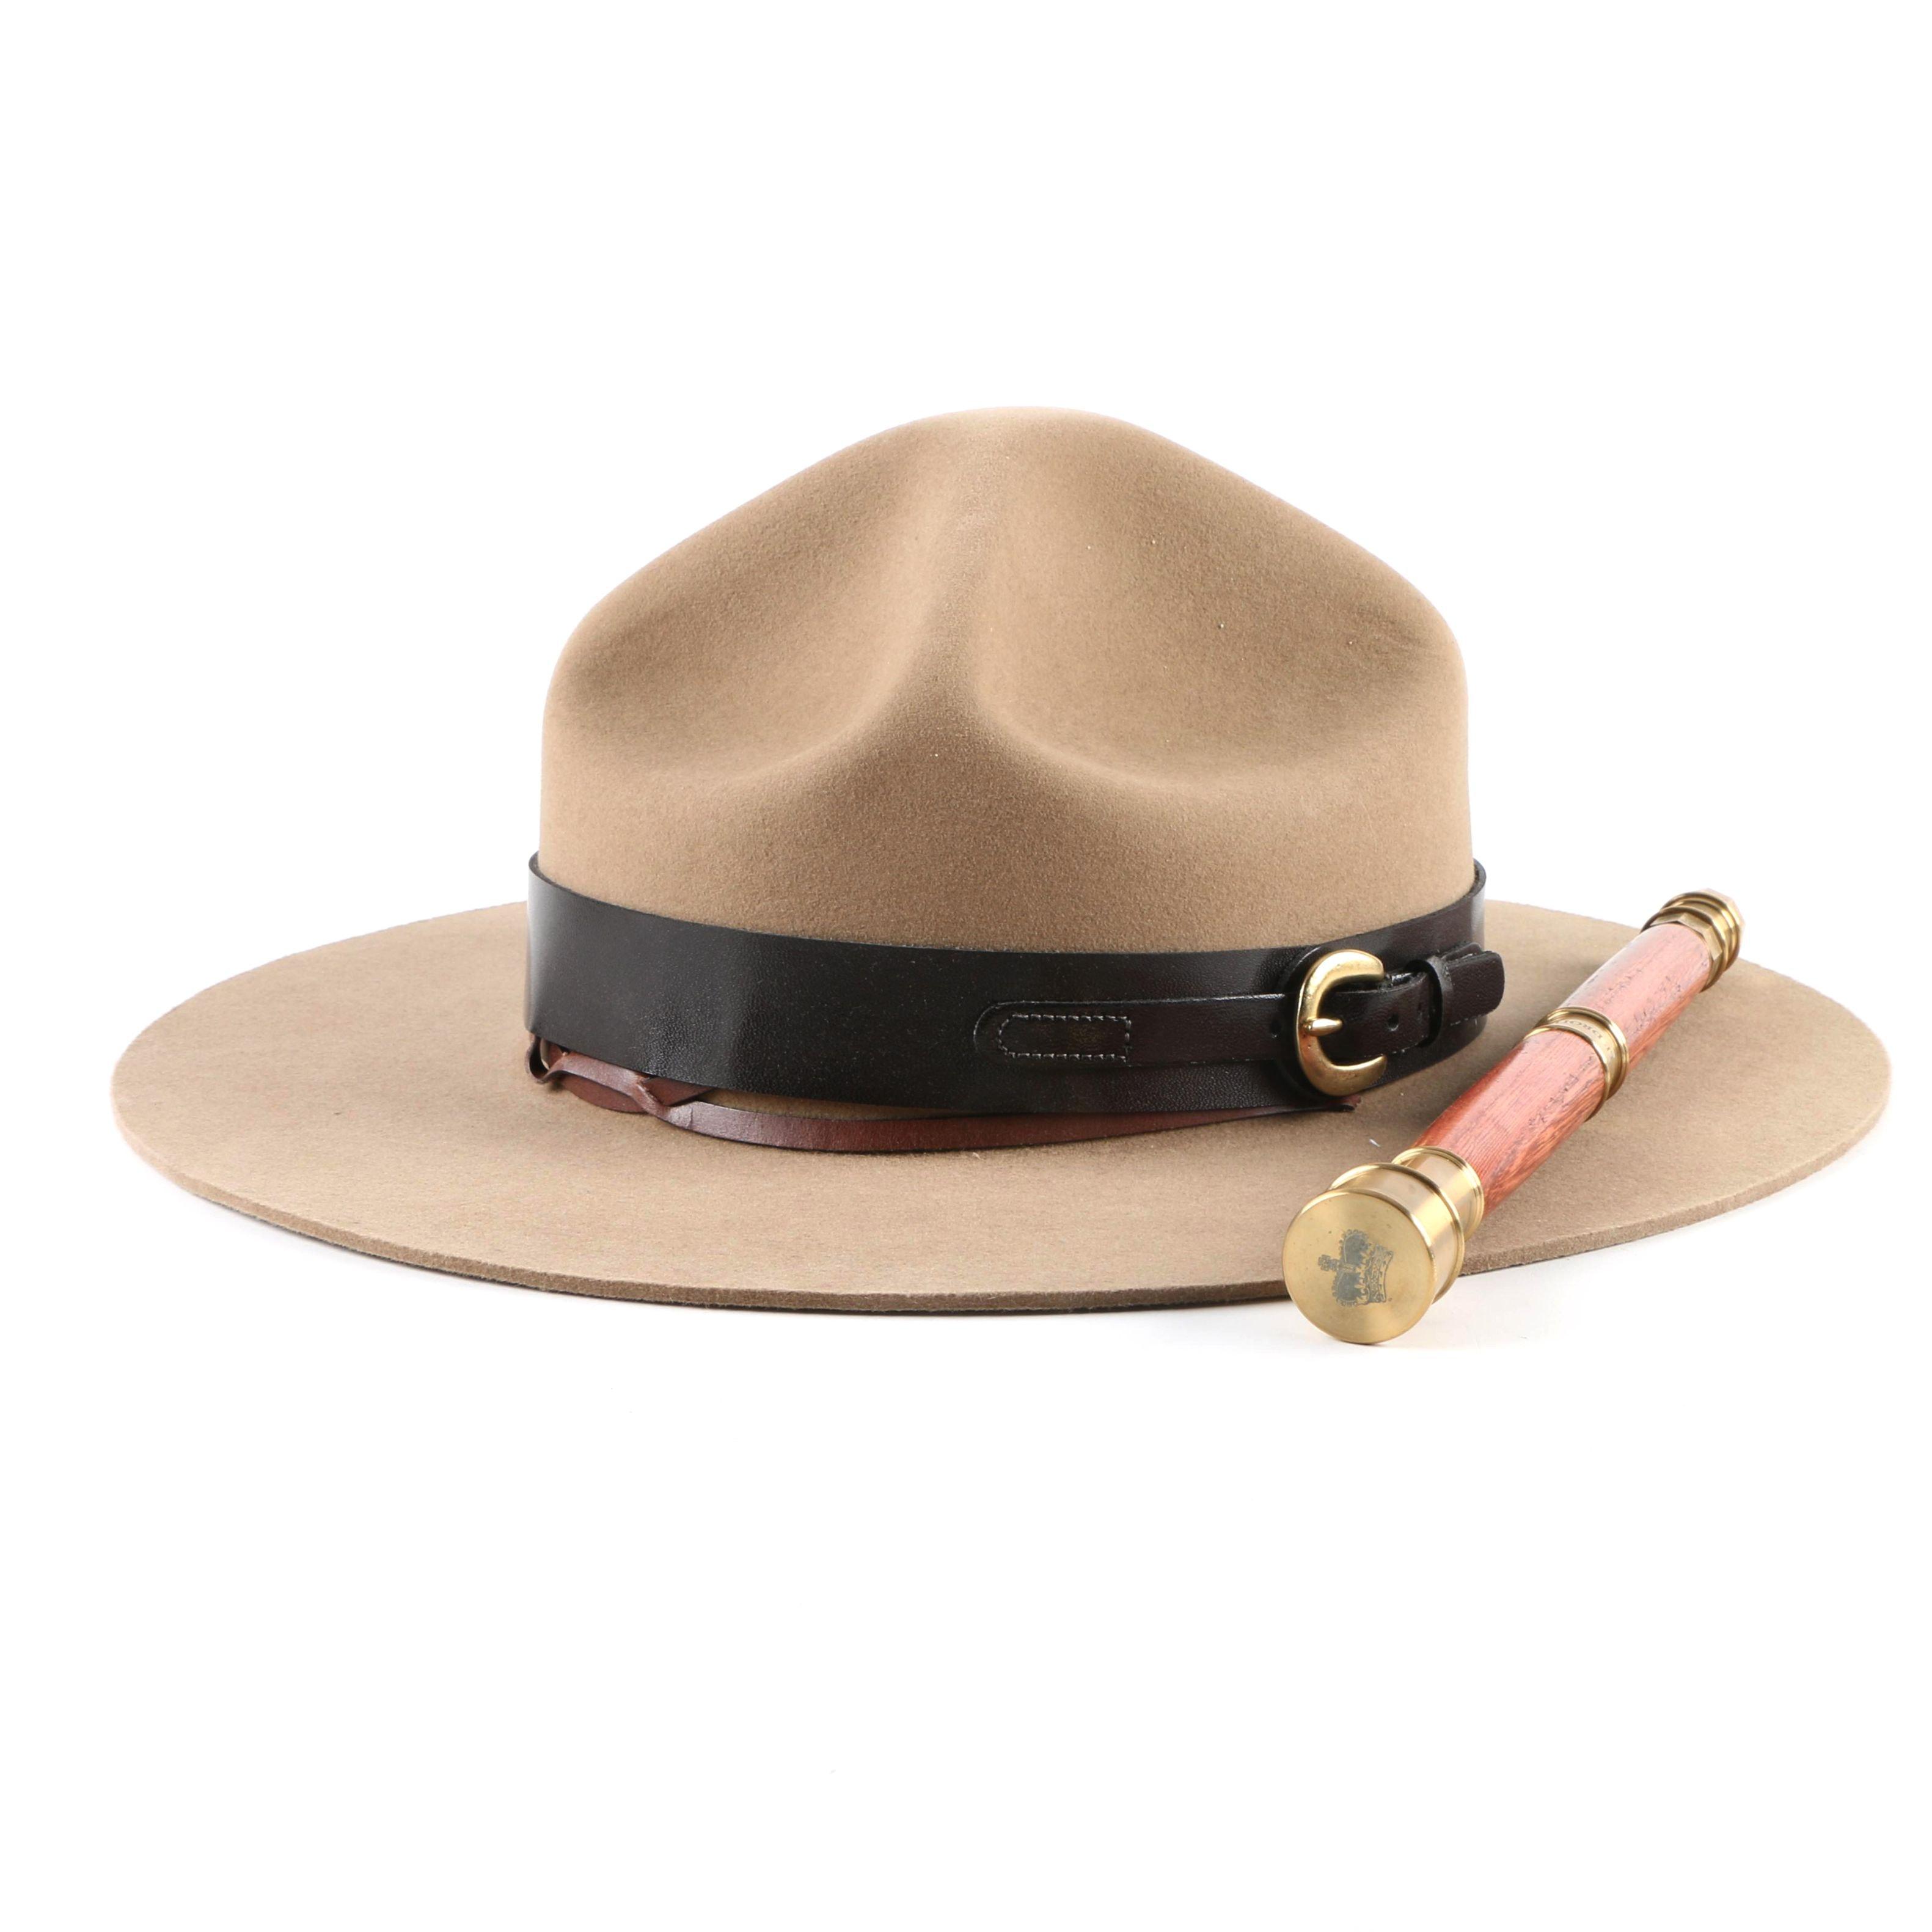 Men's Vintage Biltmore Royal Canadian Mounted Police Hat and Wooden Baton